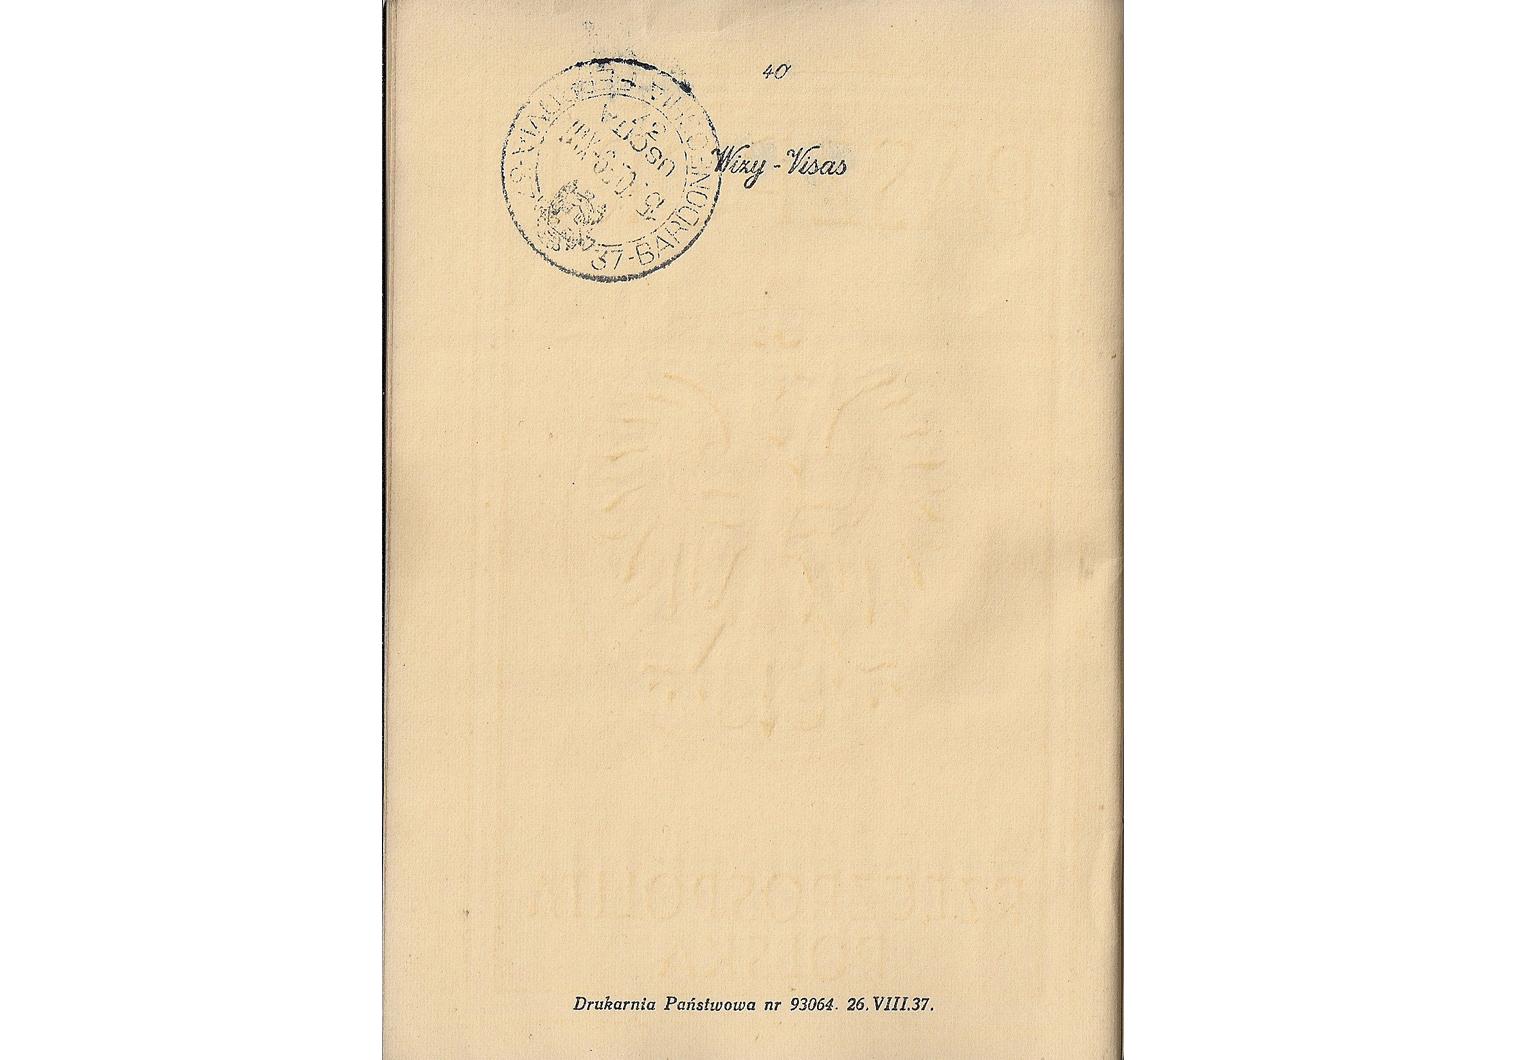 17.Drukarnia-Panstwowa-nr-9